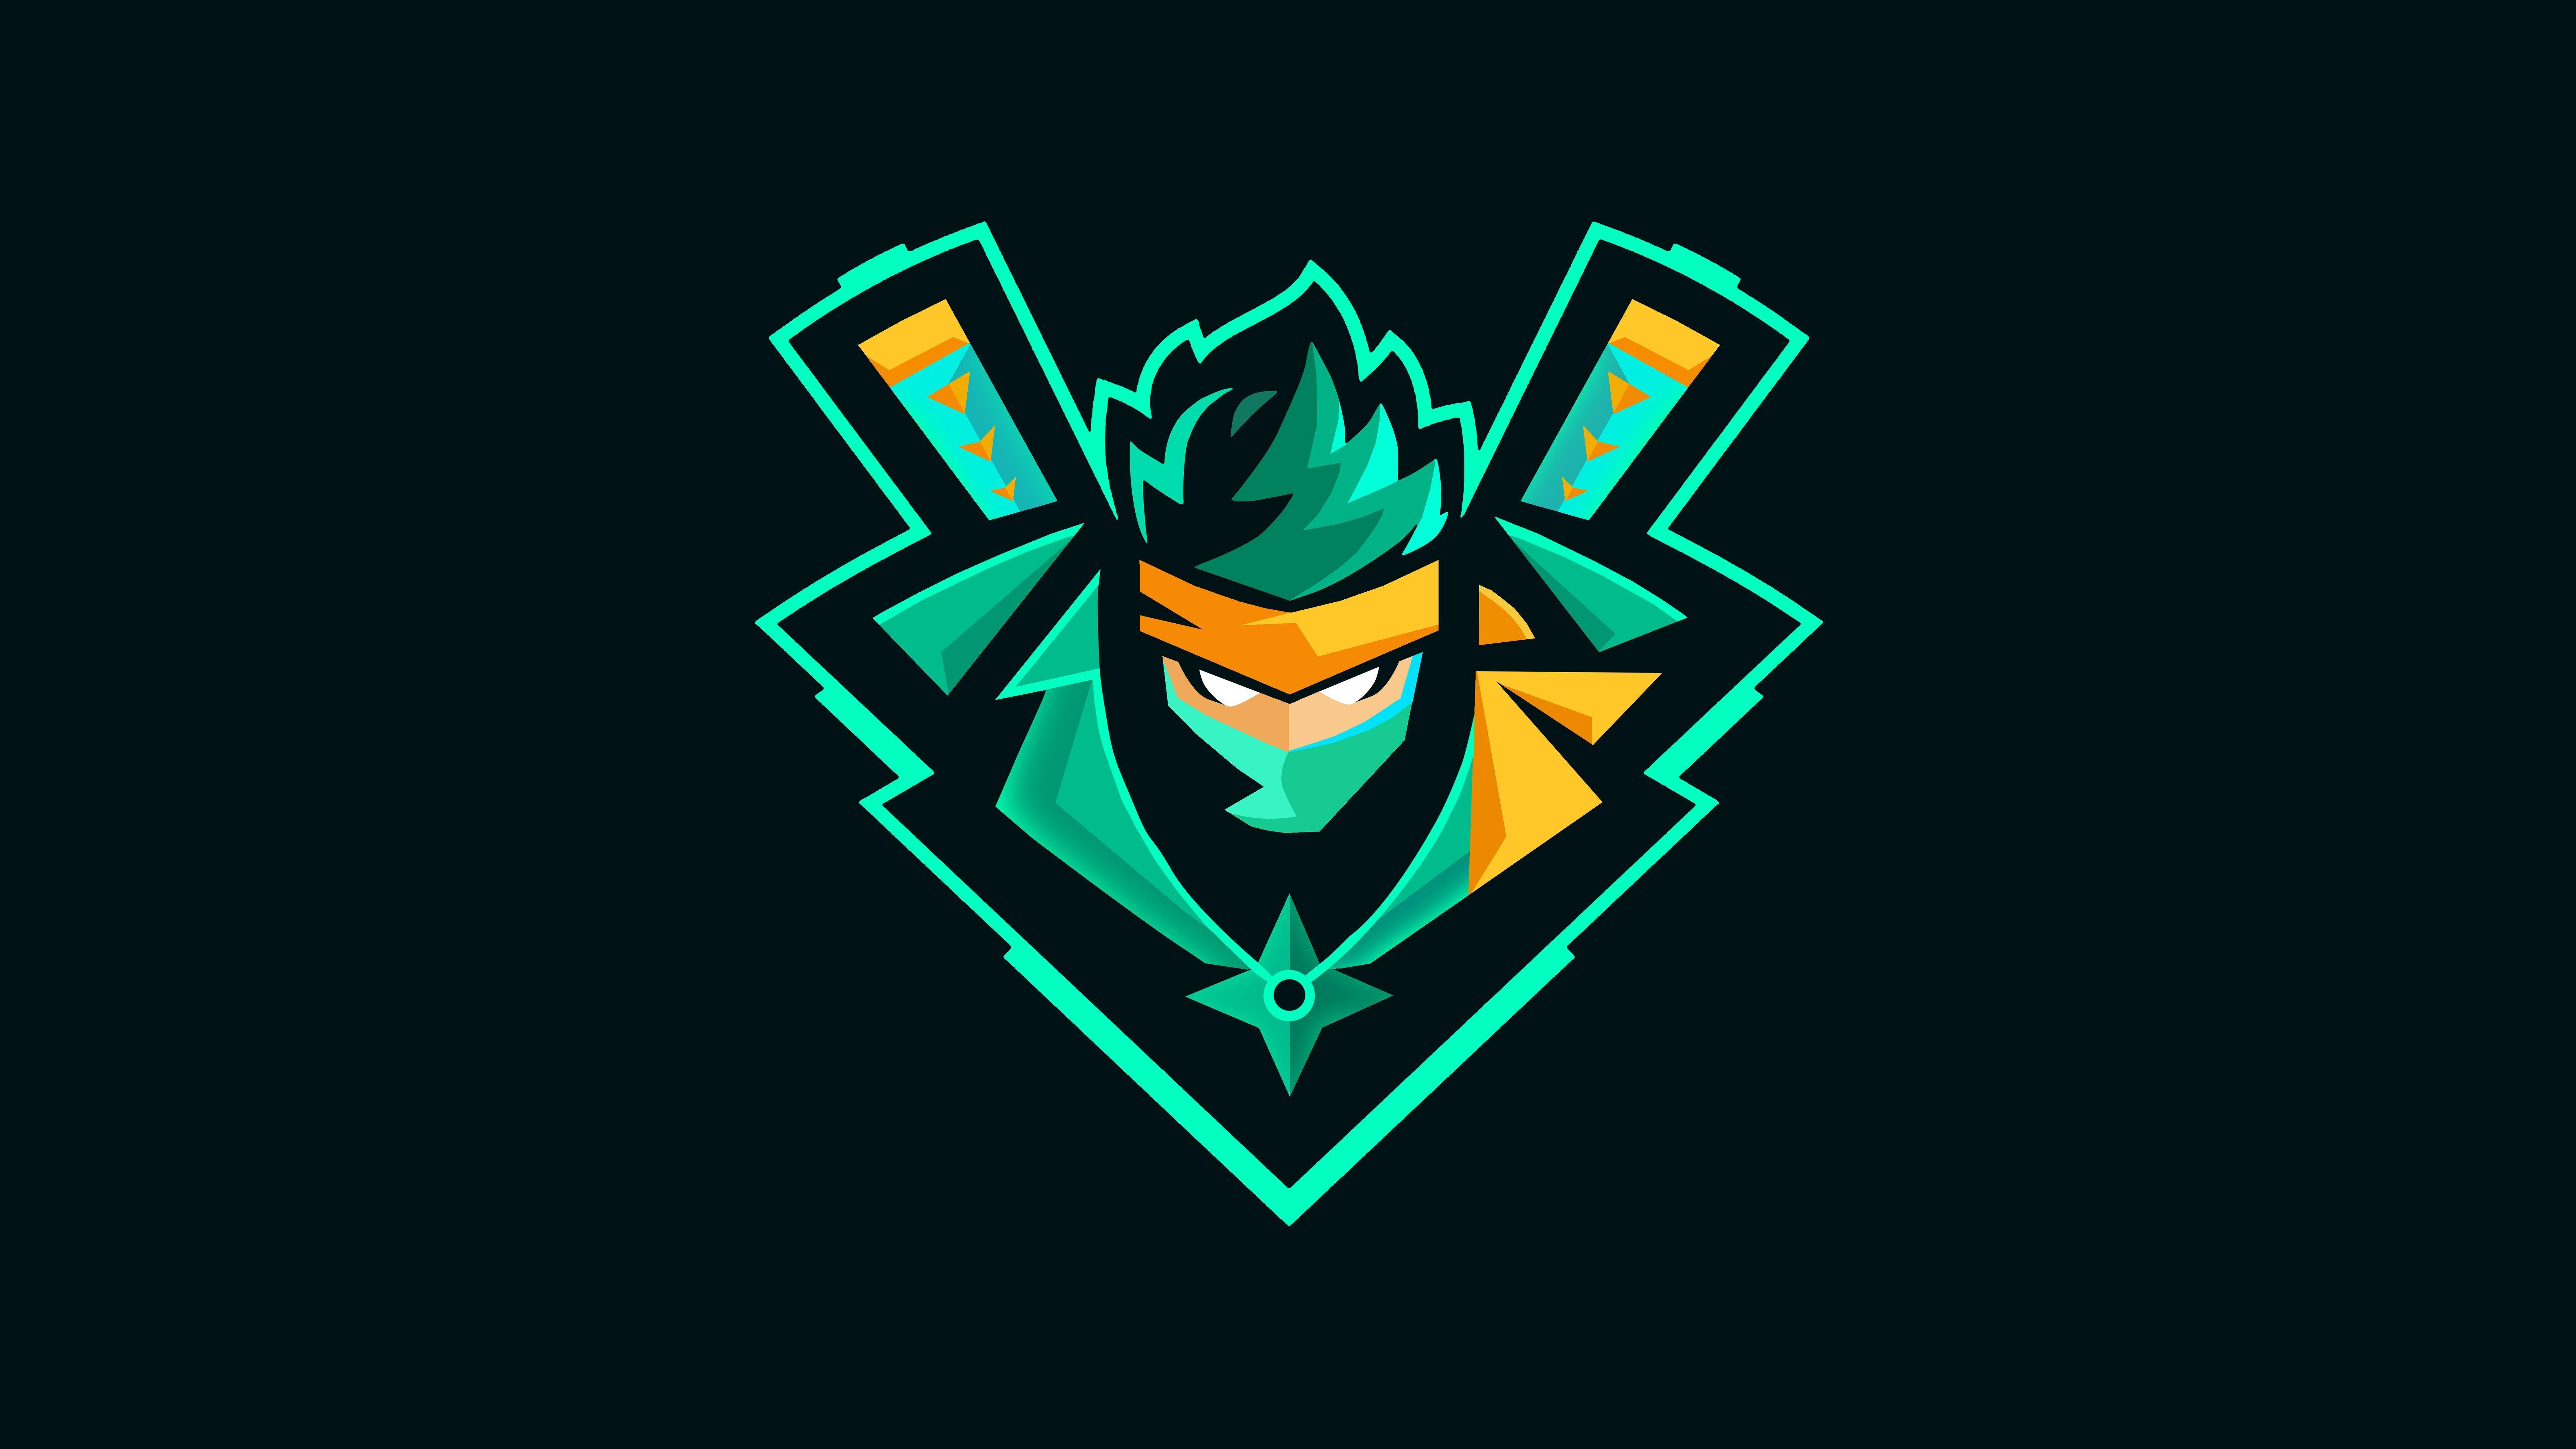 Fortnite Battle Royale Ninja Logo X Iphone X Fortnite Battle 7680x4320